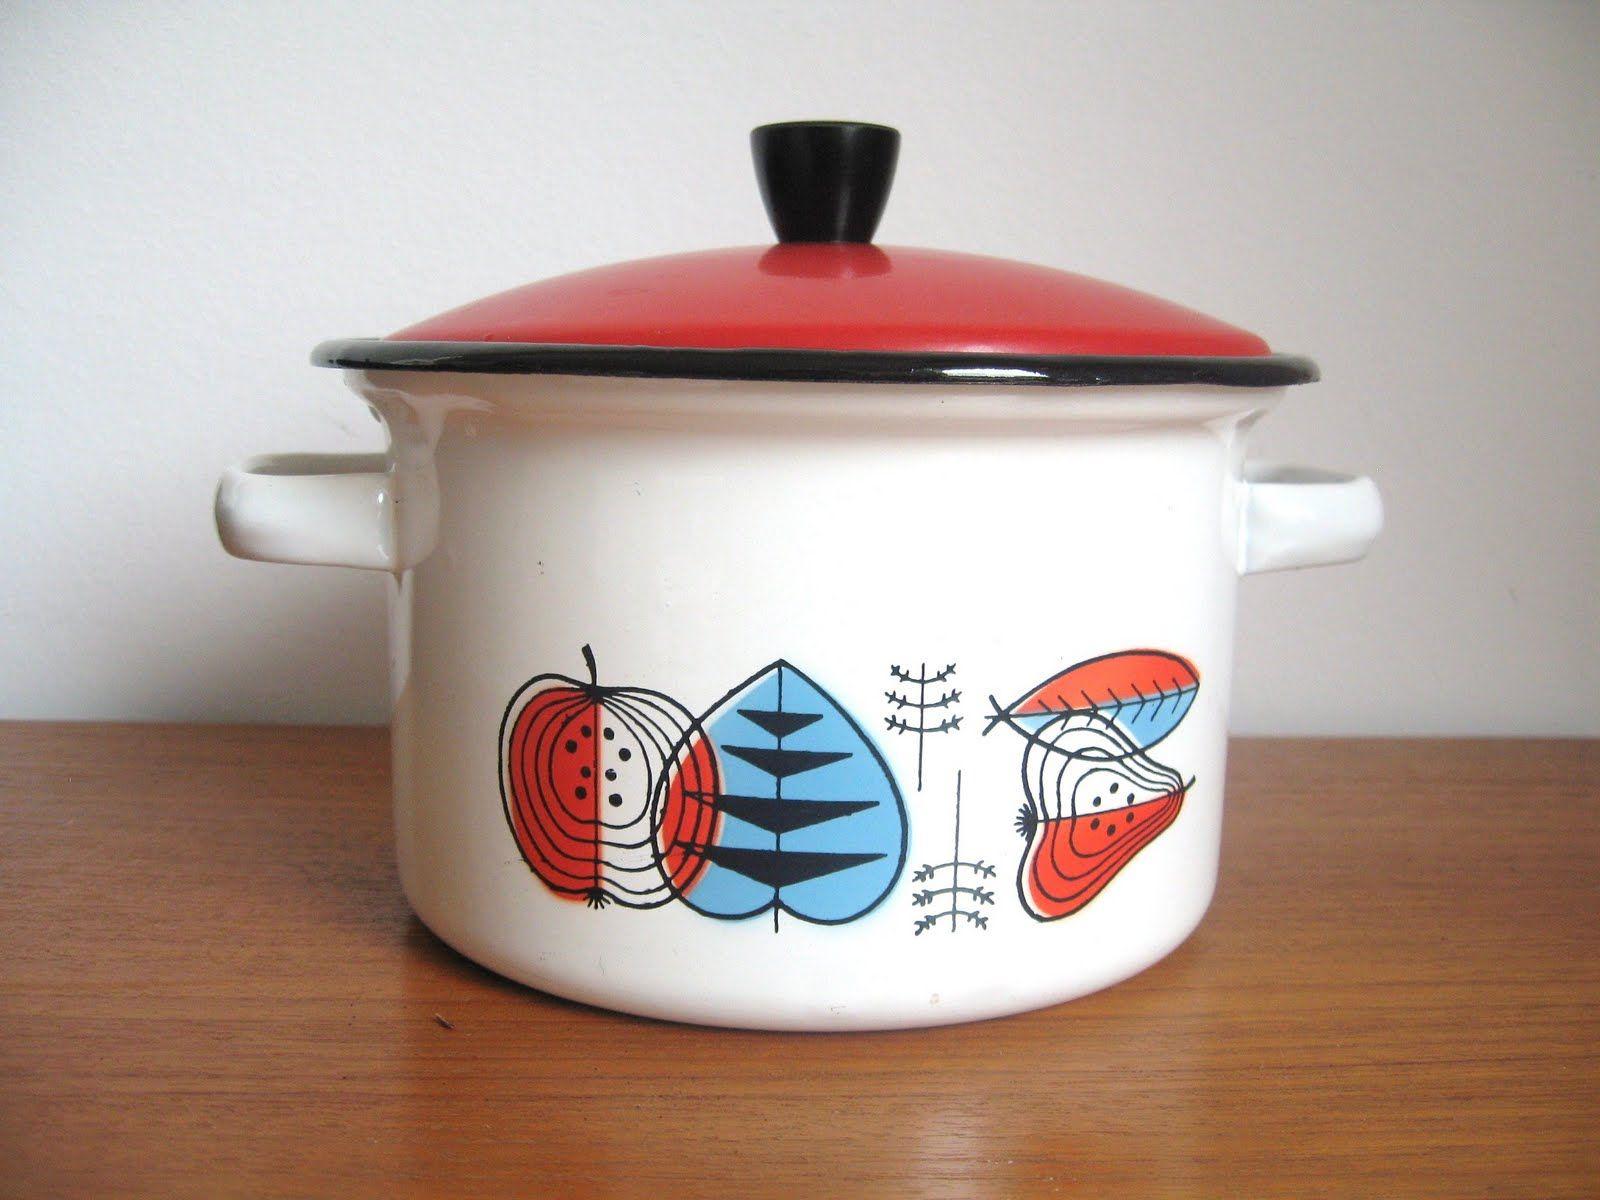 Scandinavian Enamel Cookware Google Search Enamel Cookware Nordic Design Scandinavian Design